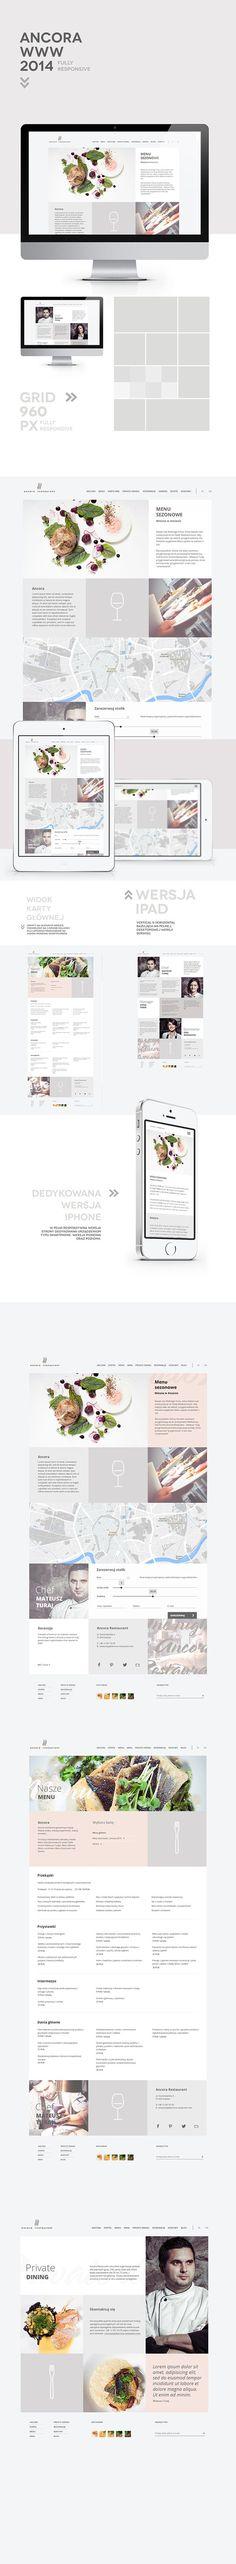 Ancora Restaurant Website by Jarek Nakielny, via Behance